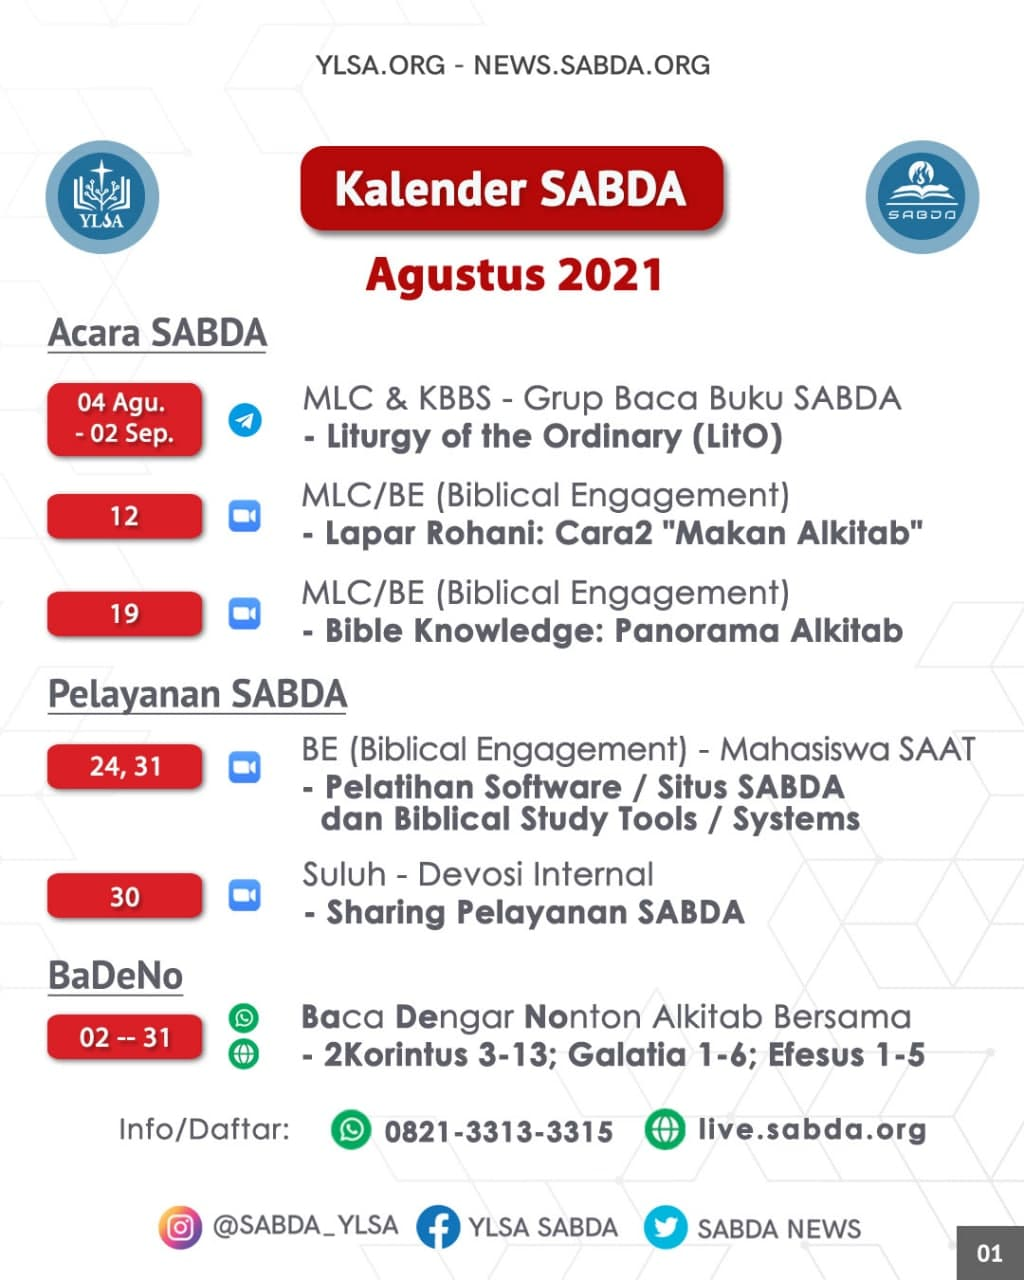 Kalender acara SABDA selama Agustus 2021.